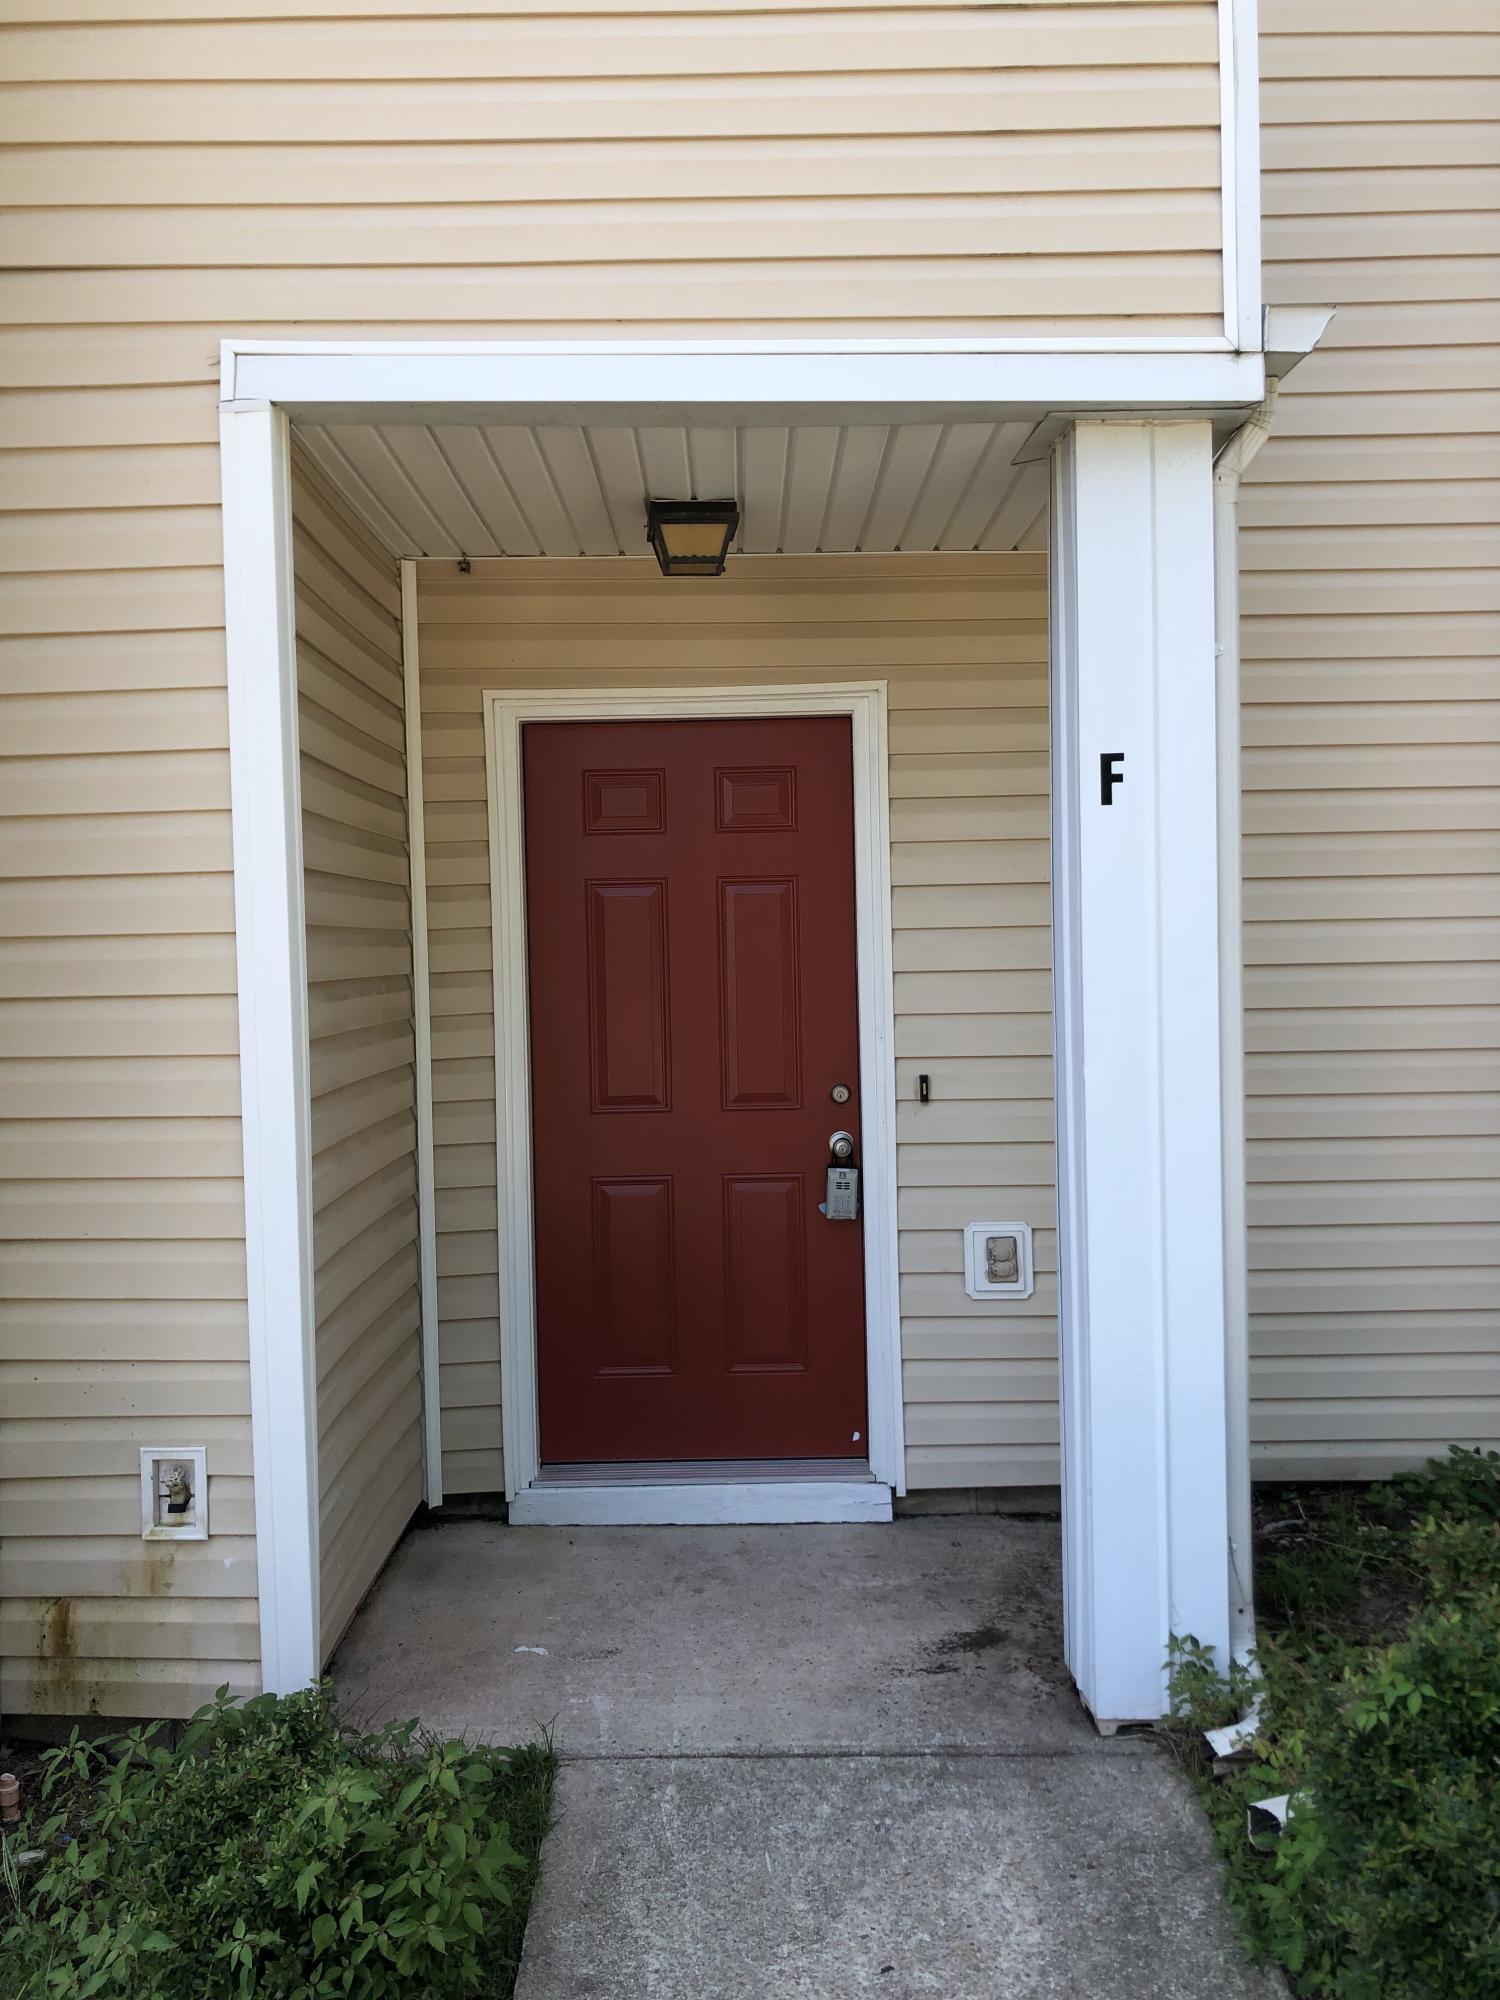 The Cedars Homes For Sale - 4075 Cedars, North Charleston, SC - 16